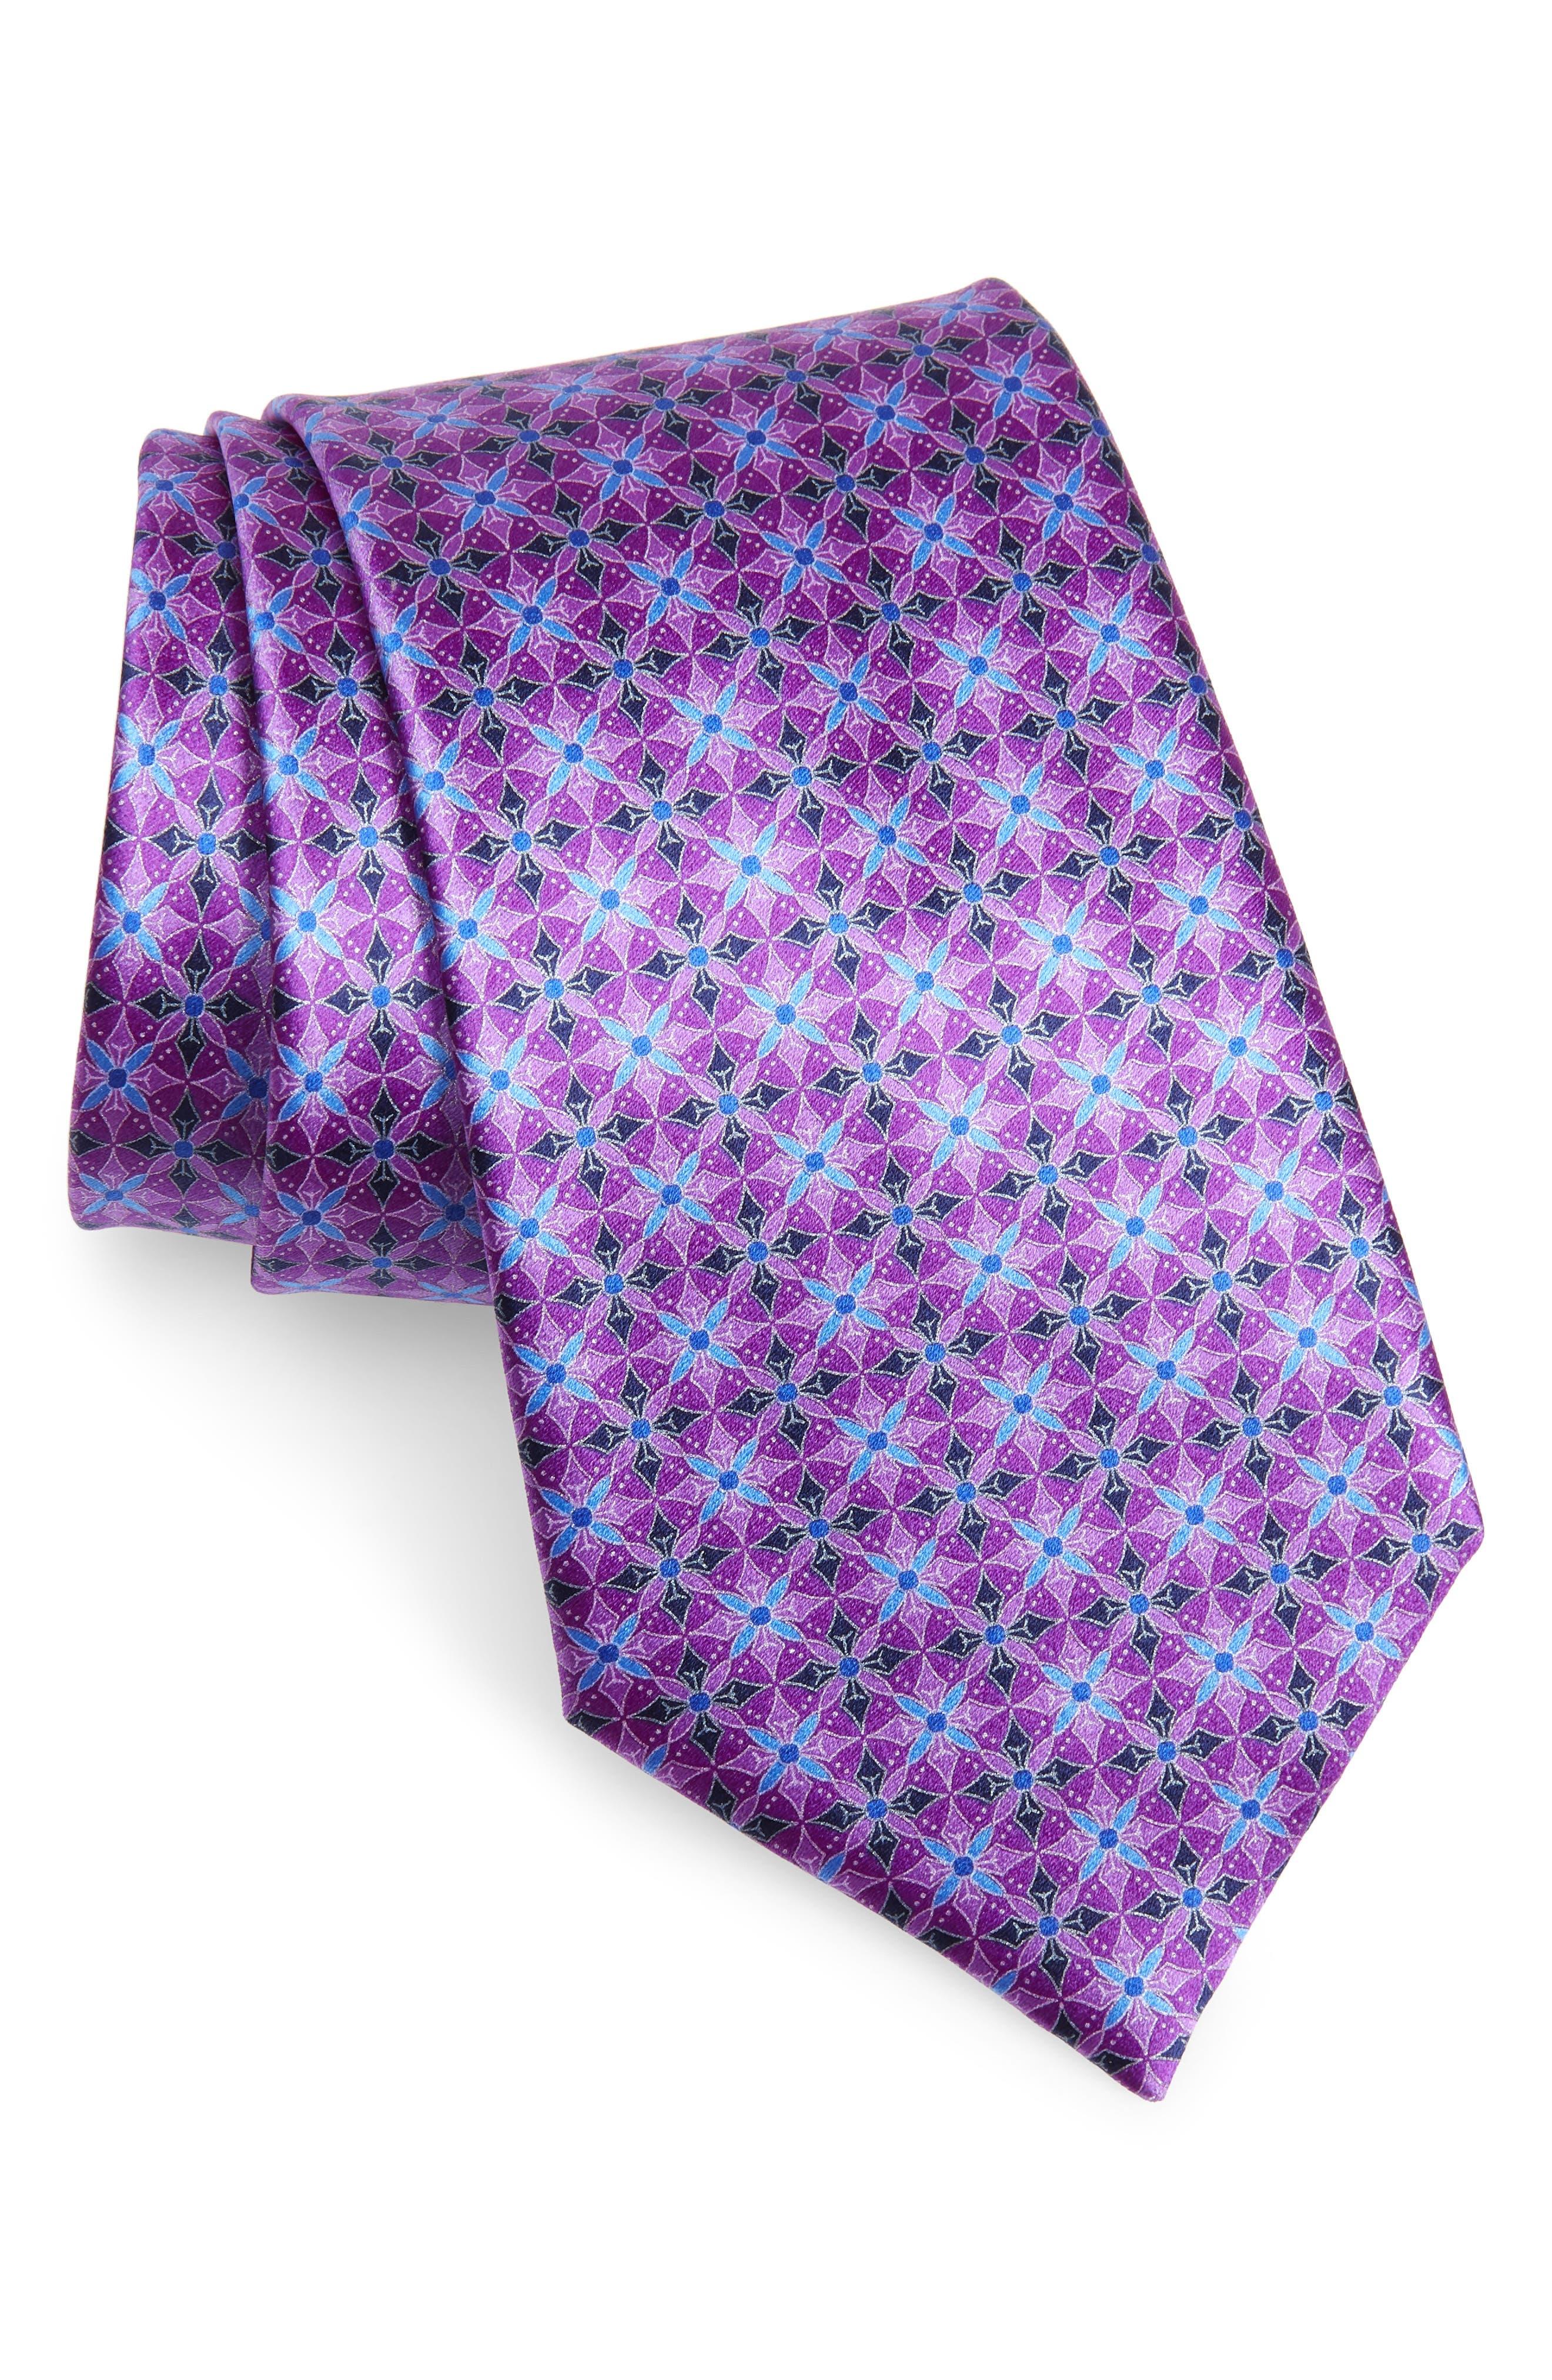 ERMENEGILDO ZEGNA Geometric Silk Tie, Main, color, PURPLE